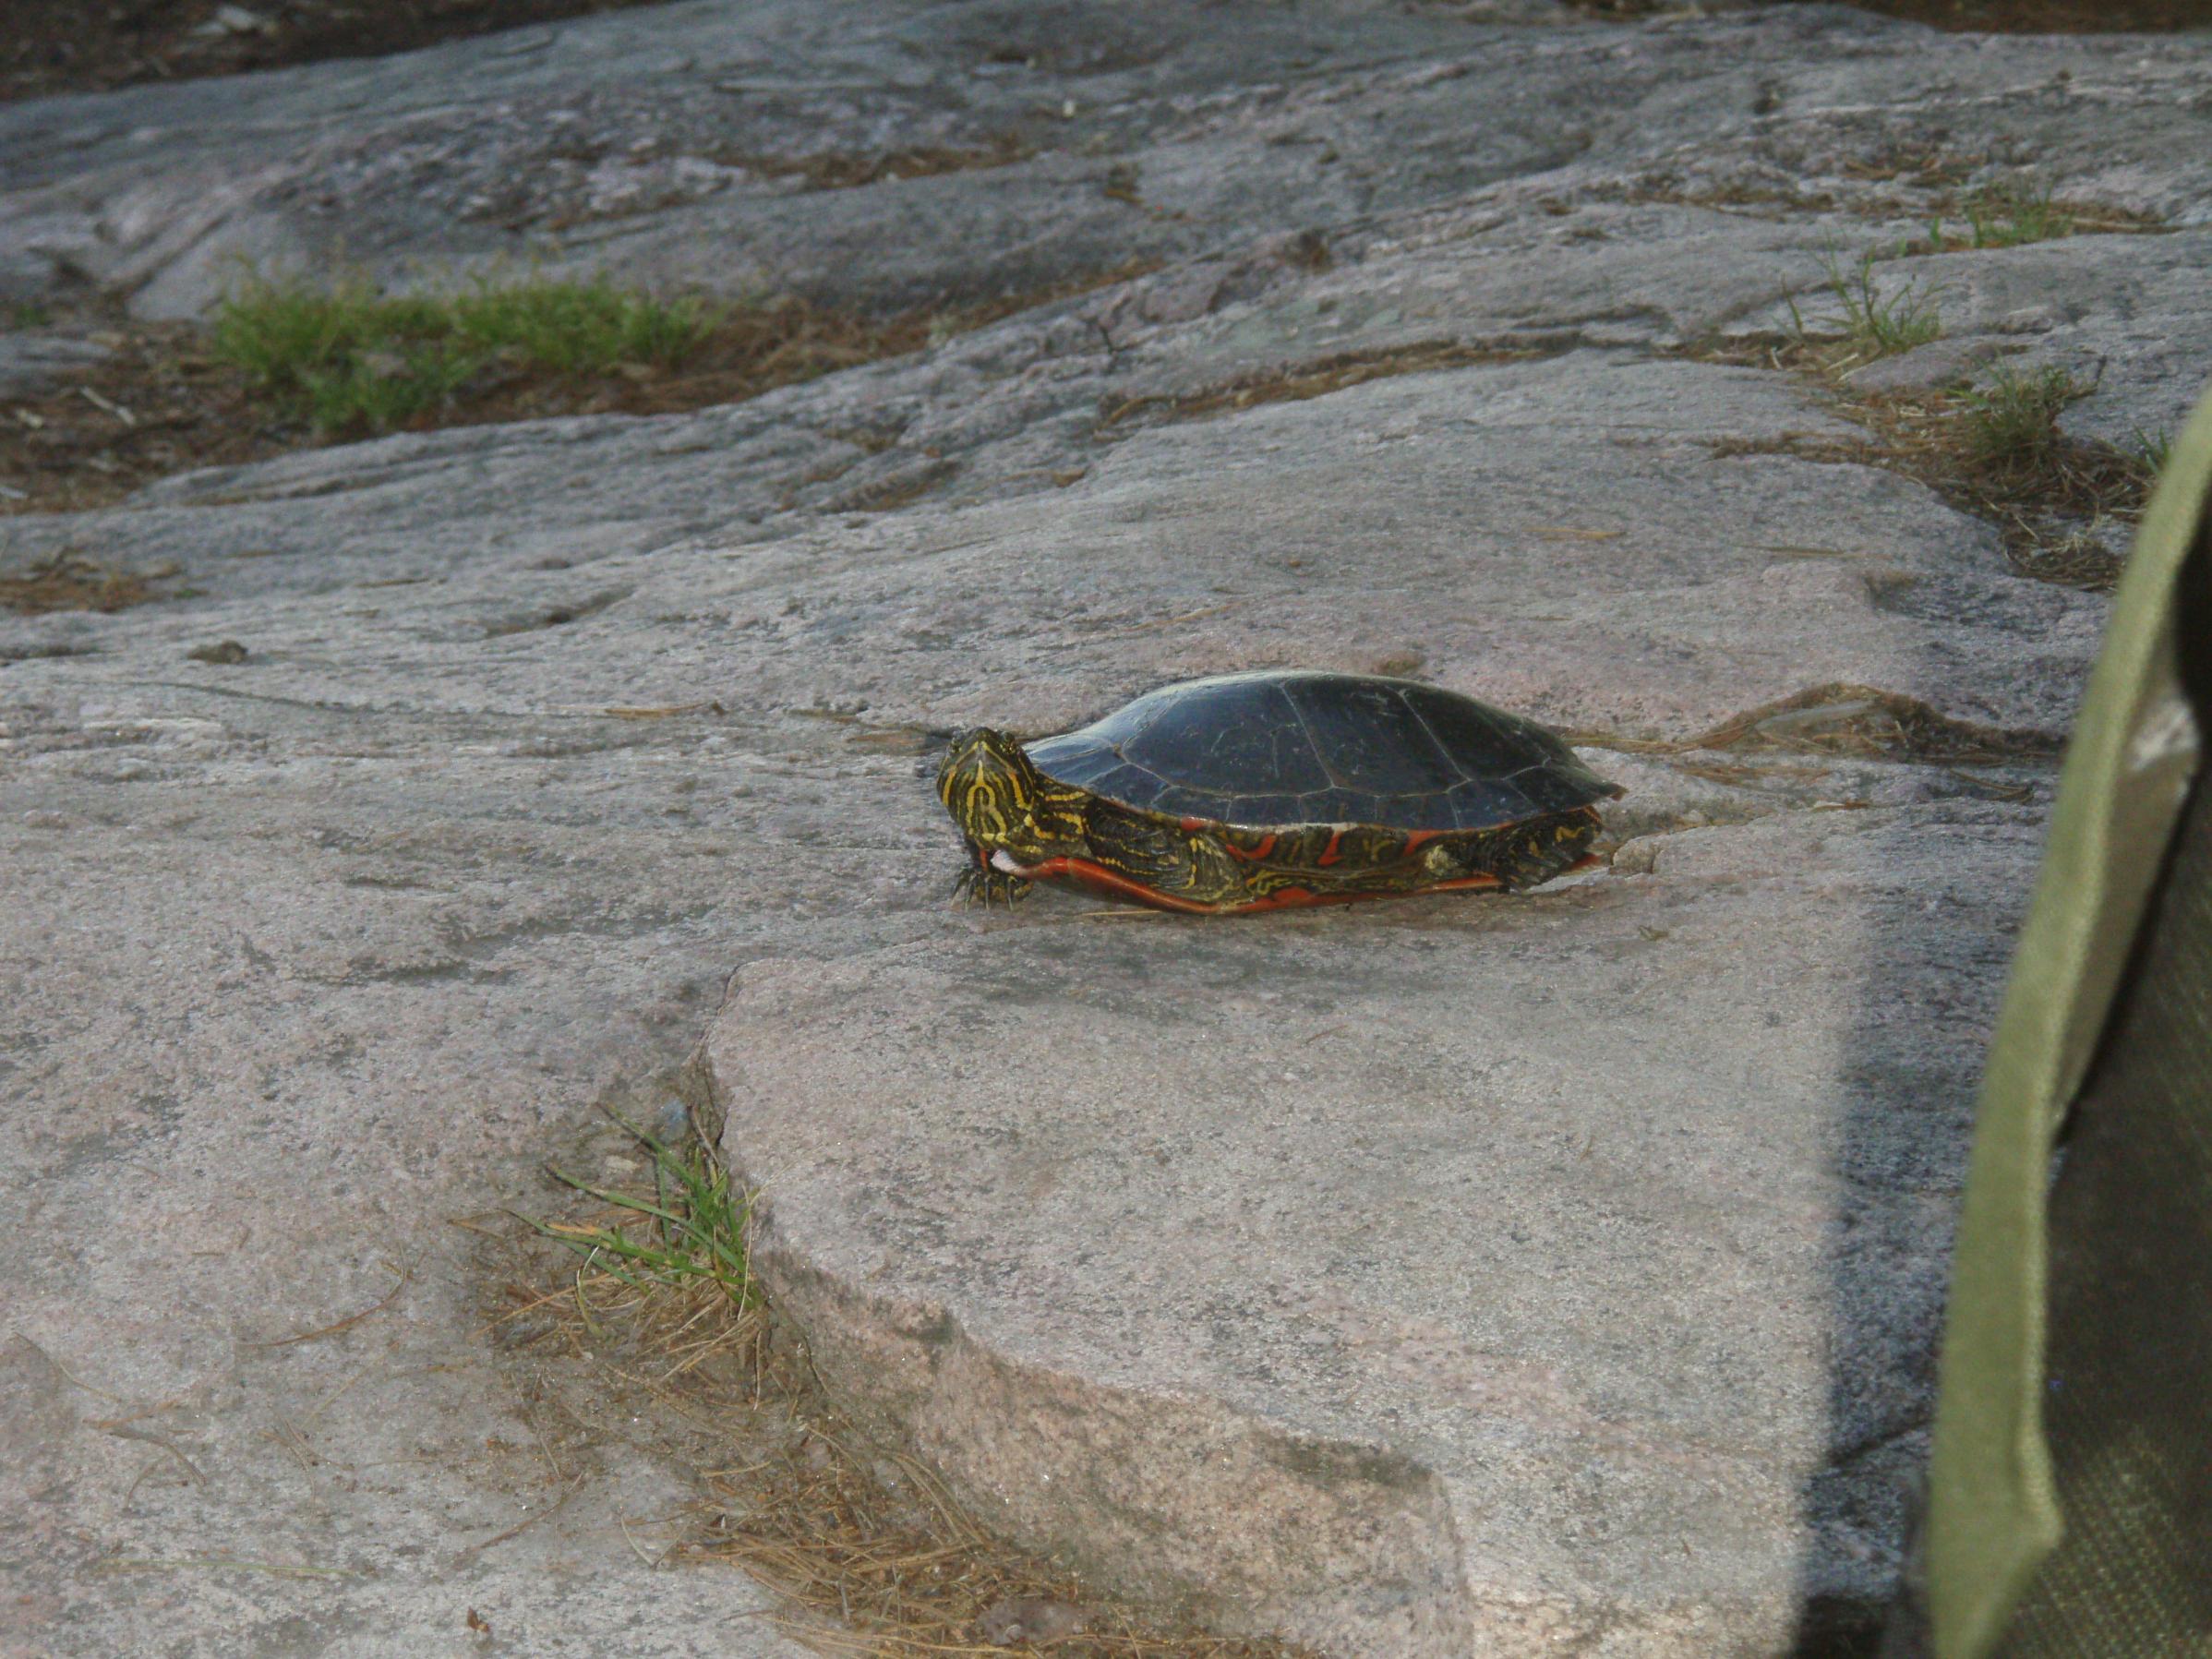 Upper Pauness Turtle